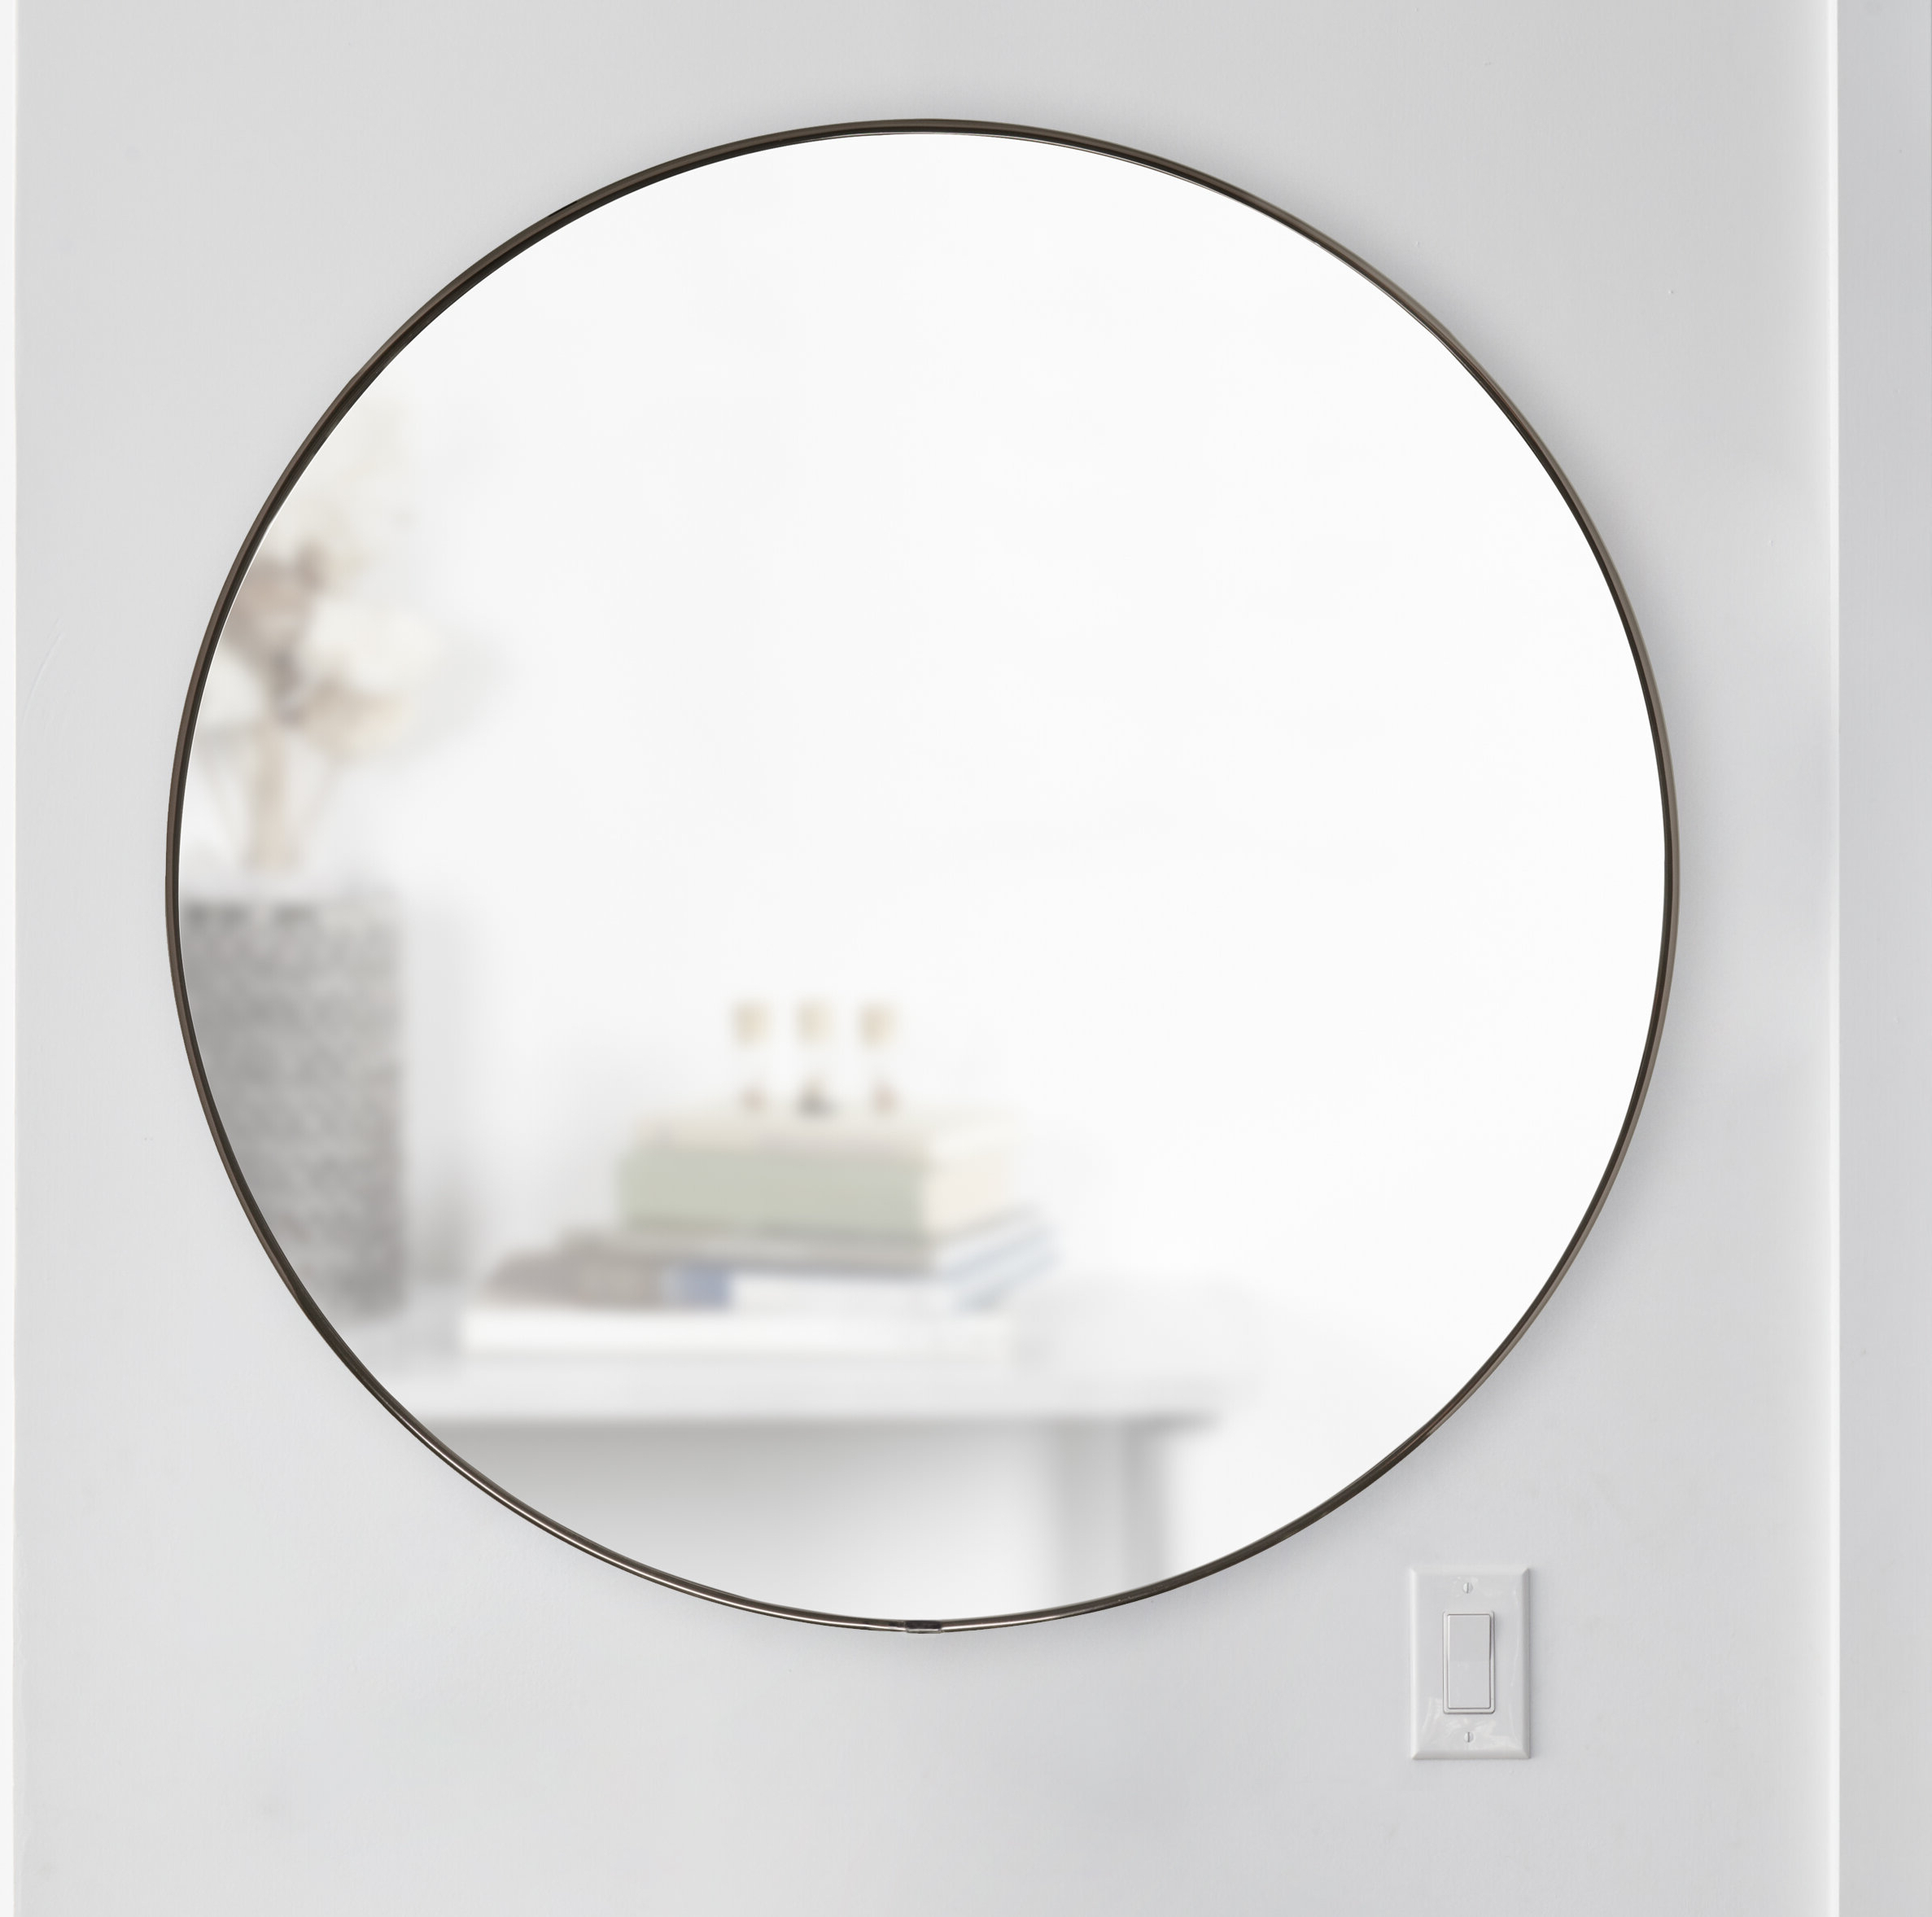 Rhein Accent Mirrors In Recent Hubba Modern & Contemporary Accent Mirror (View 9 of 20)